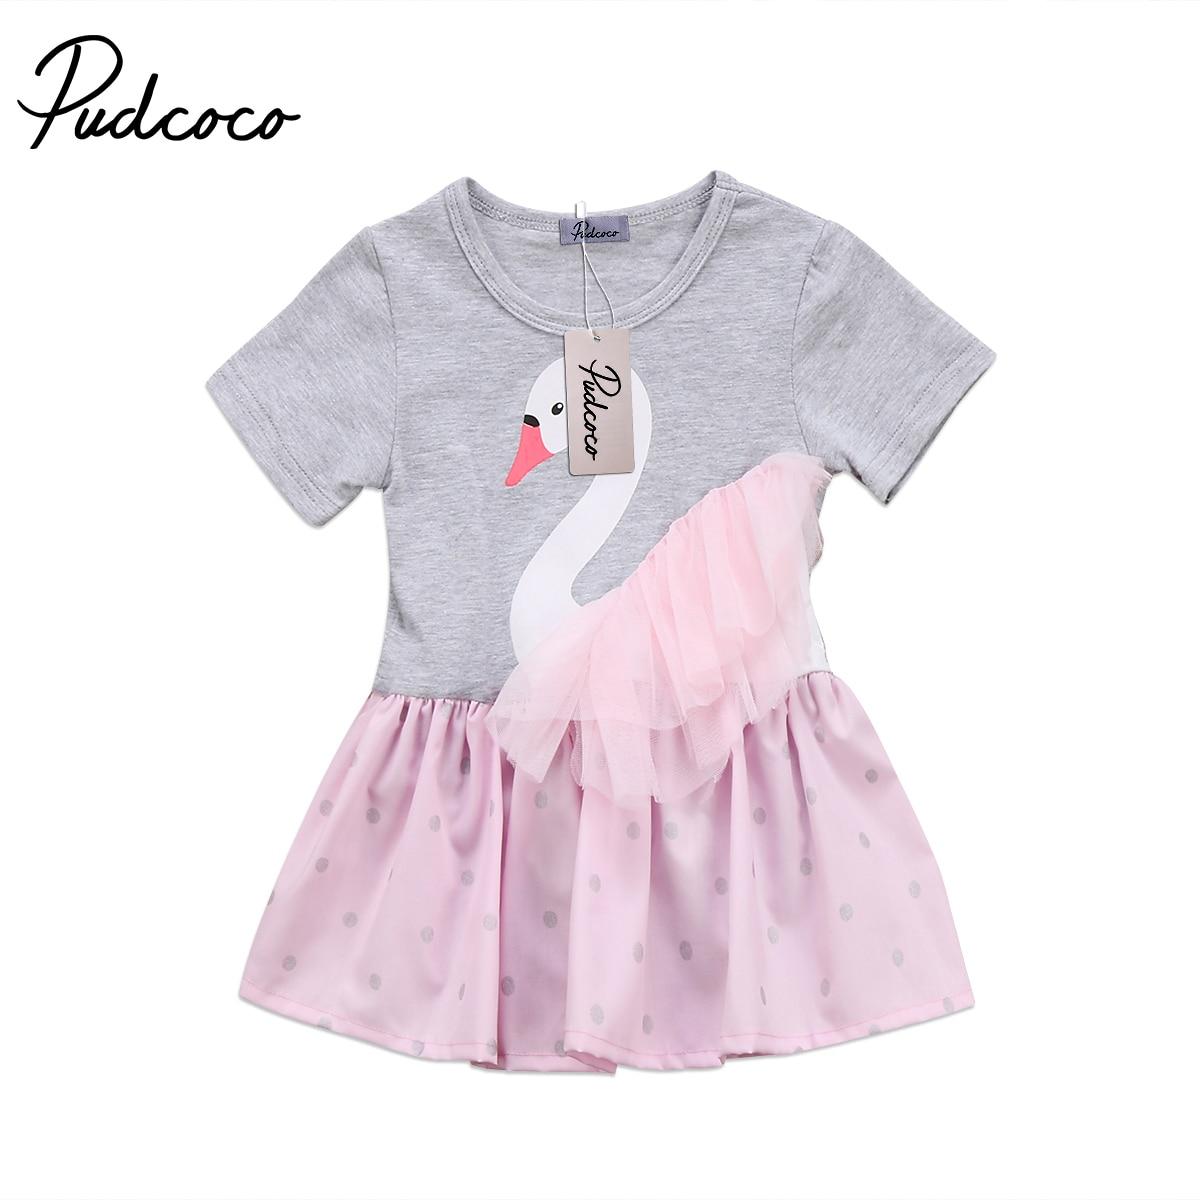 Cute Newborn Baby Girl Swan Cotton Short Sleeve Romper Dress Lace Dot Patchwork Dress Clothes